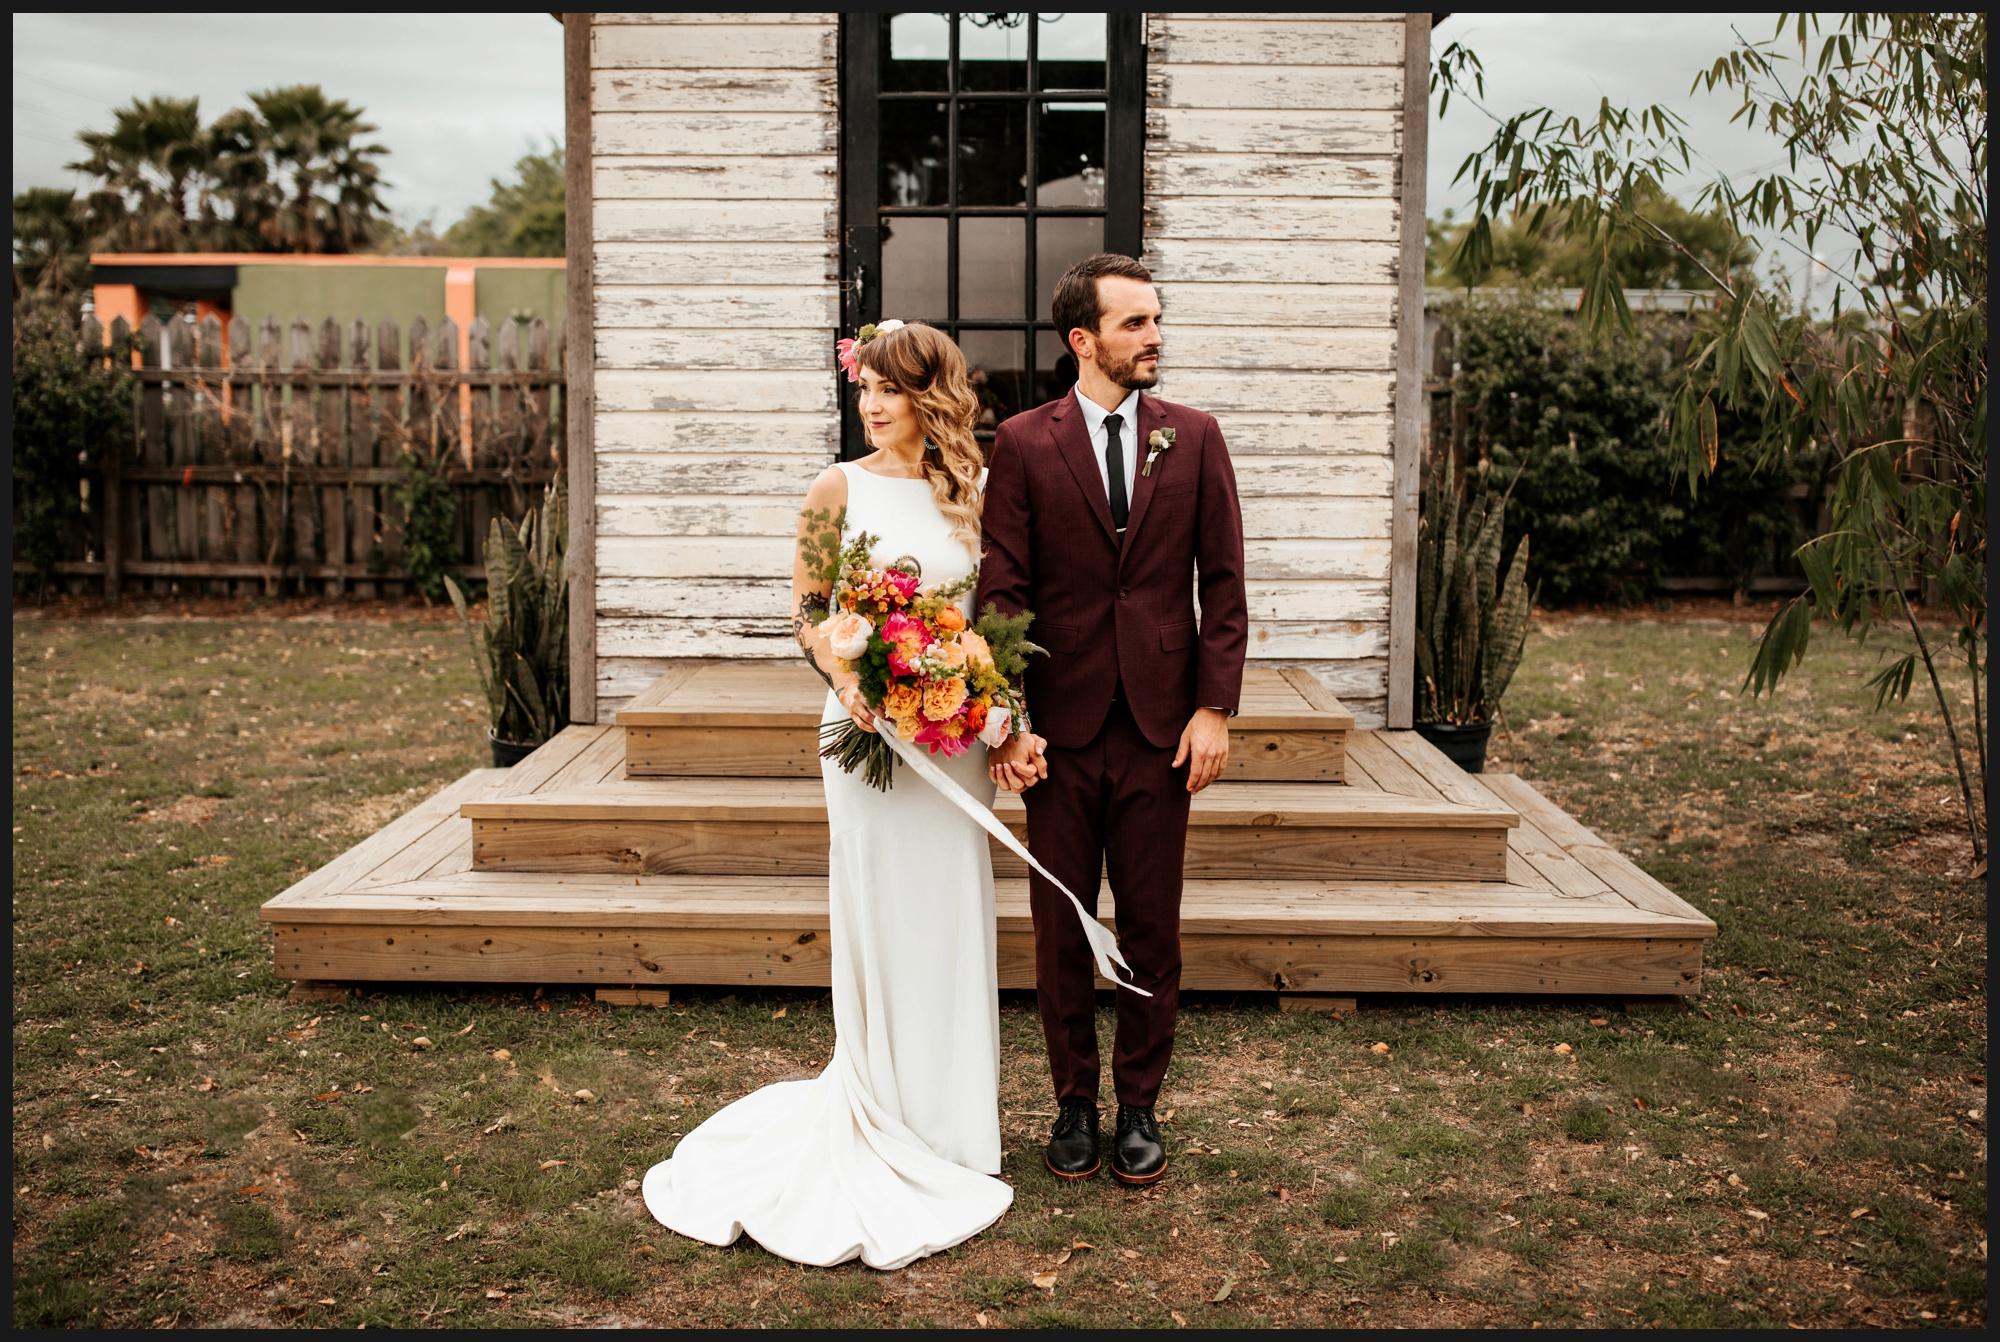 Orlando-Wedding-Photographer-destination-wedding-photographer-florida-wedding-photographer-bohemian-wedding-photographer_1993.jpg